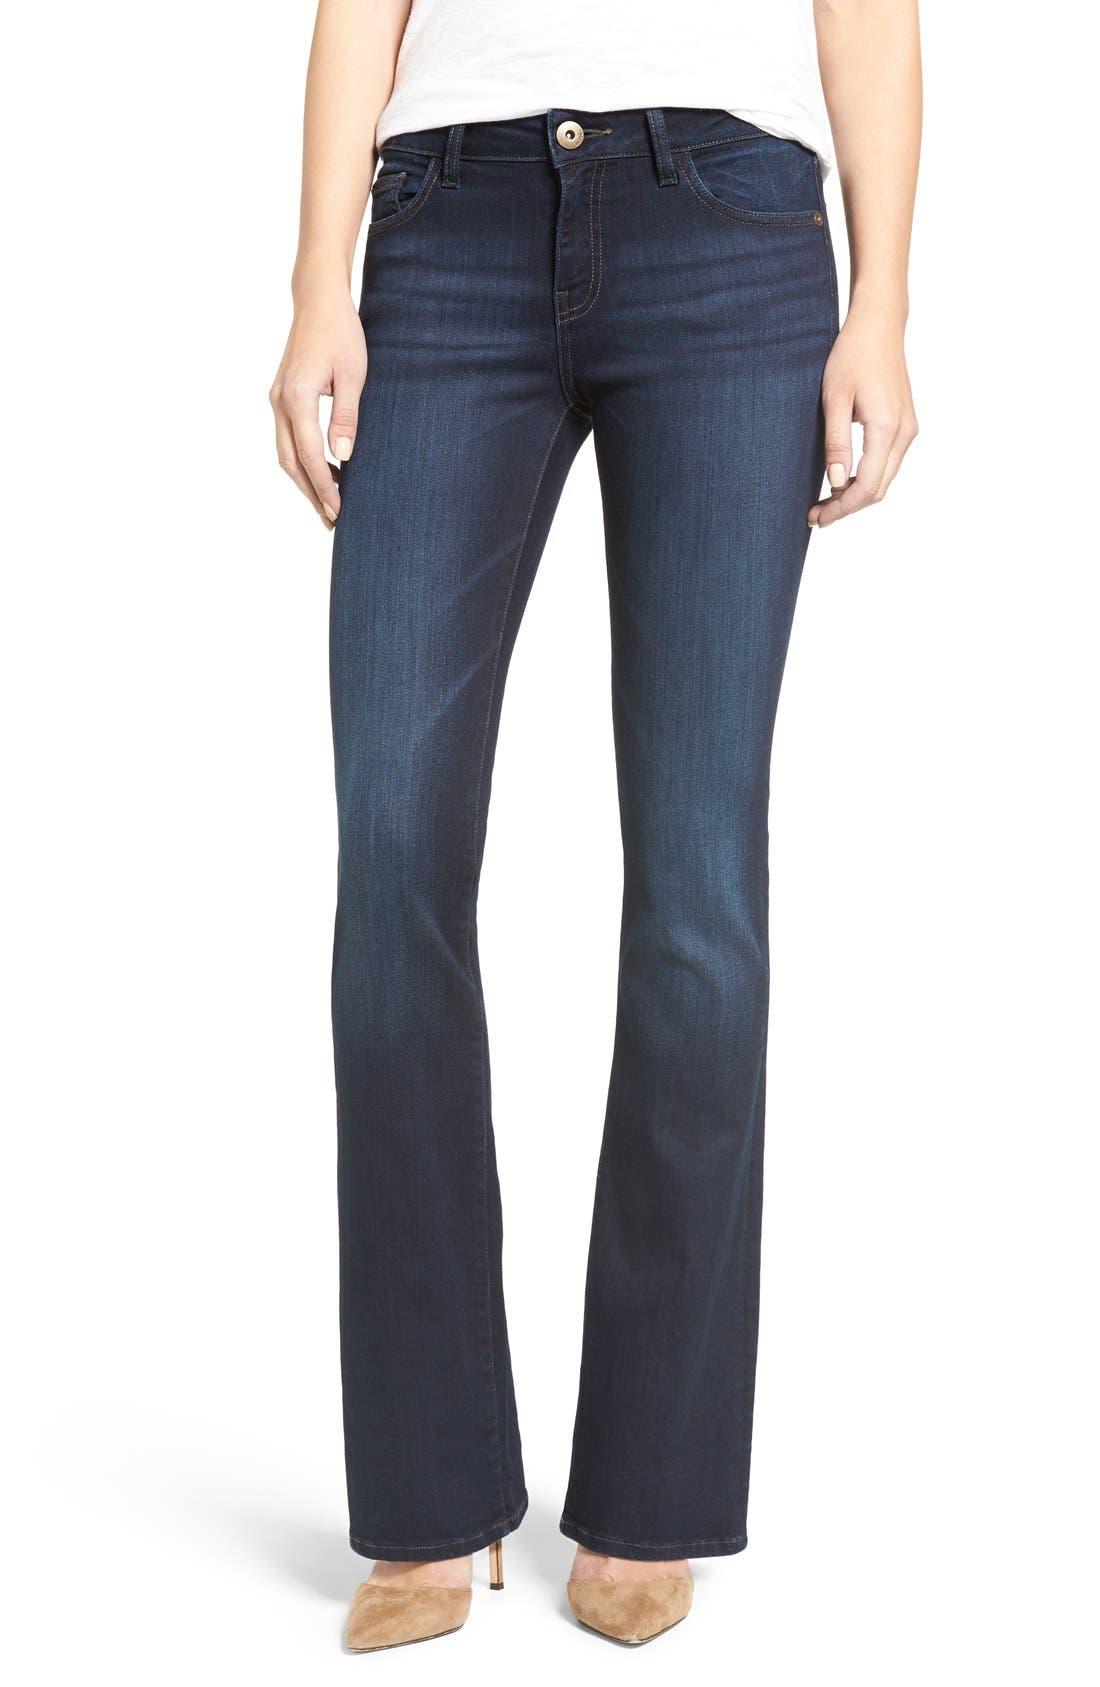 DL1961 1961 'Bridget 33' Bootcut Jeans in Peak